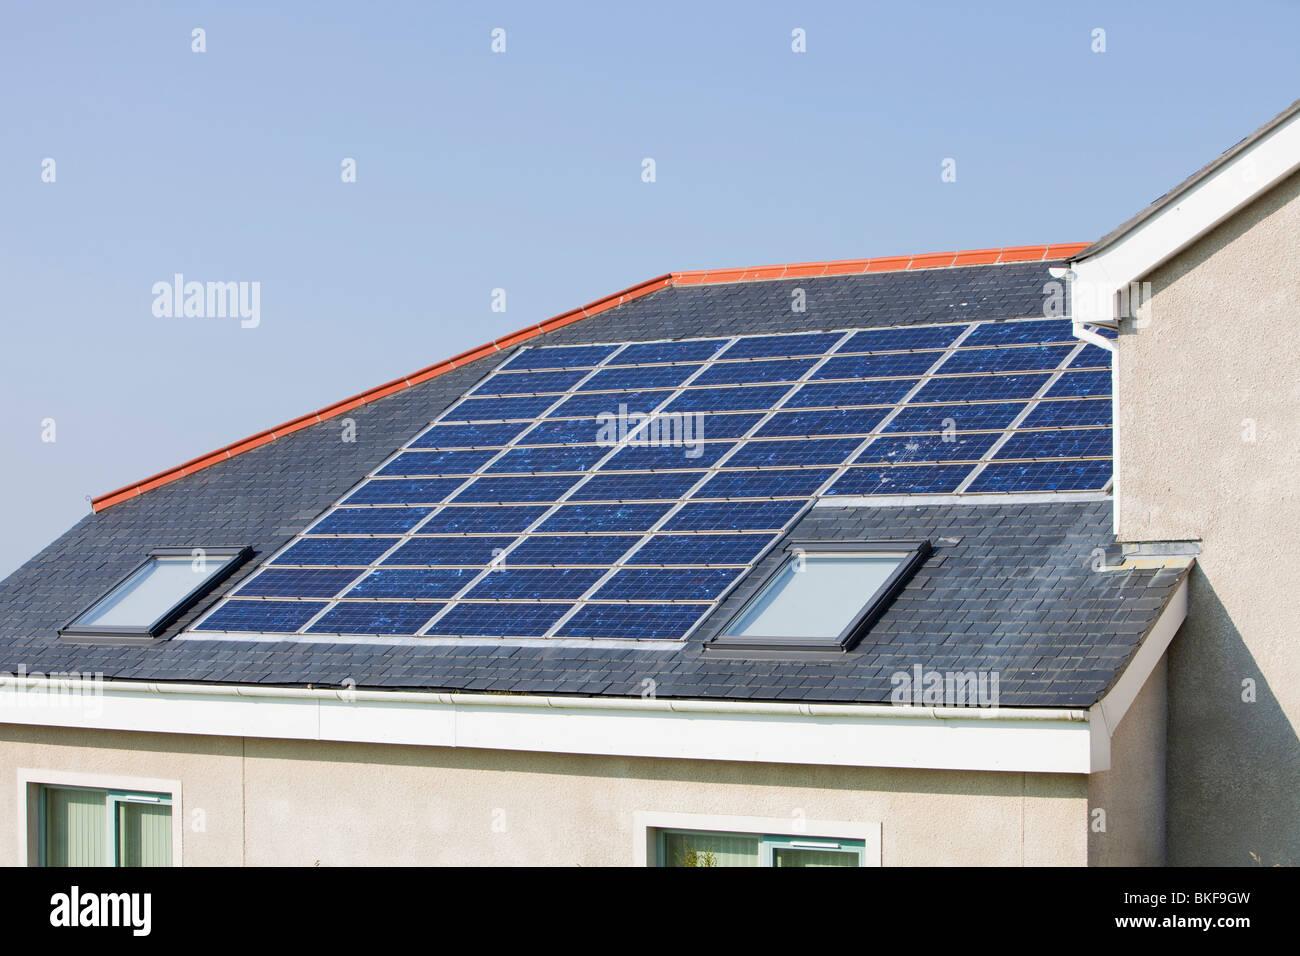 Solar Panels Roof School Stock Photos Amp Solar Panels Roof